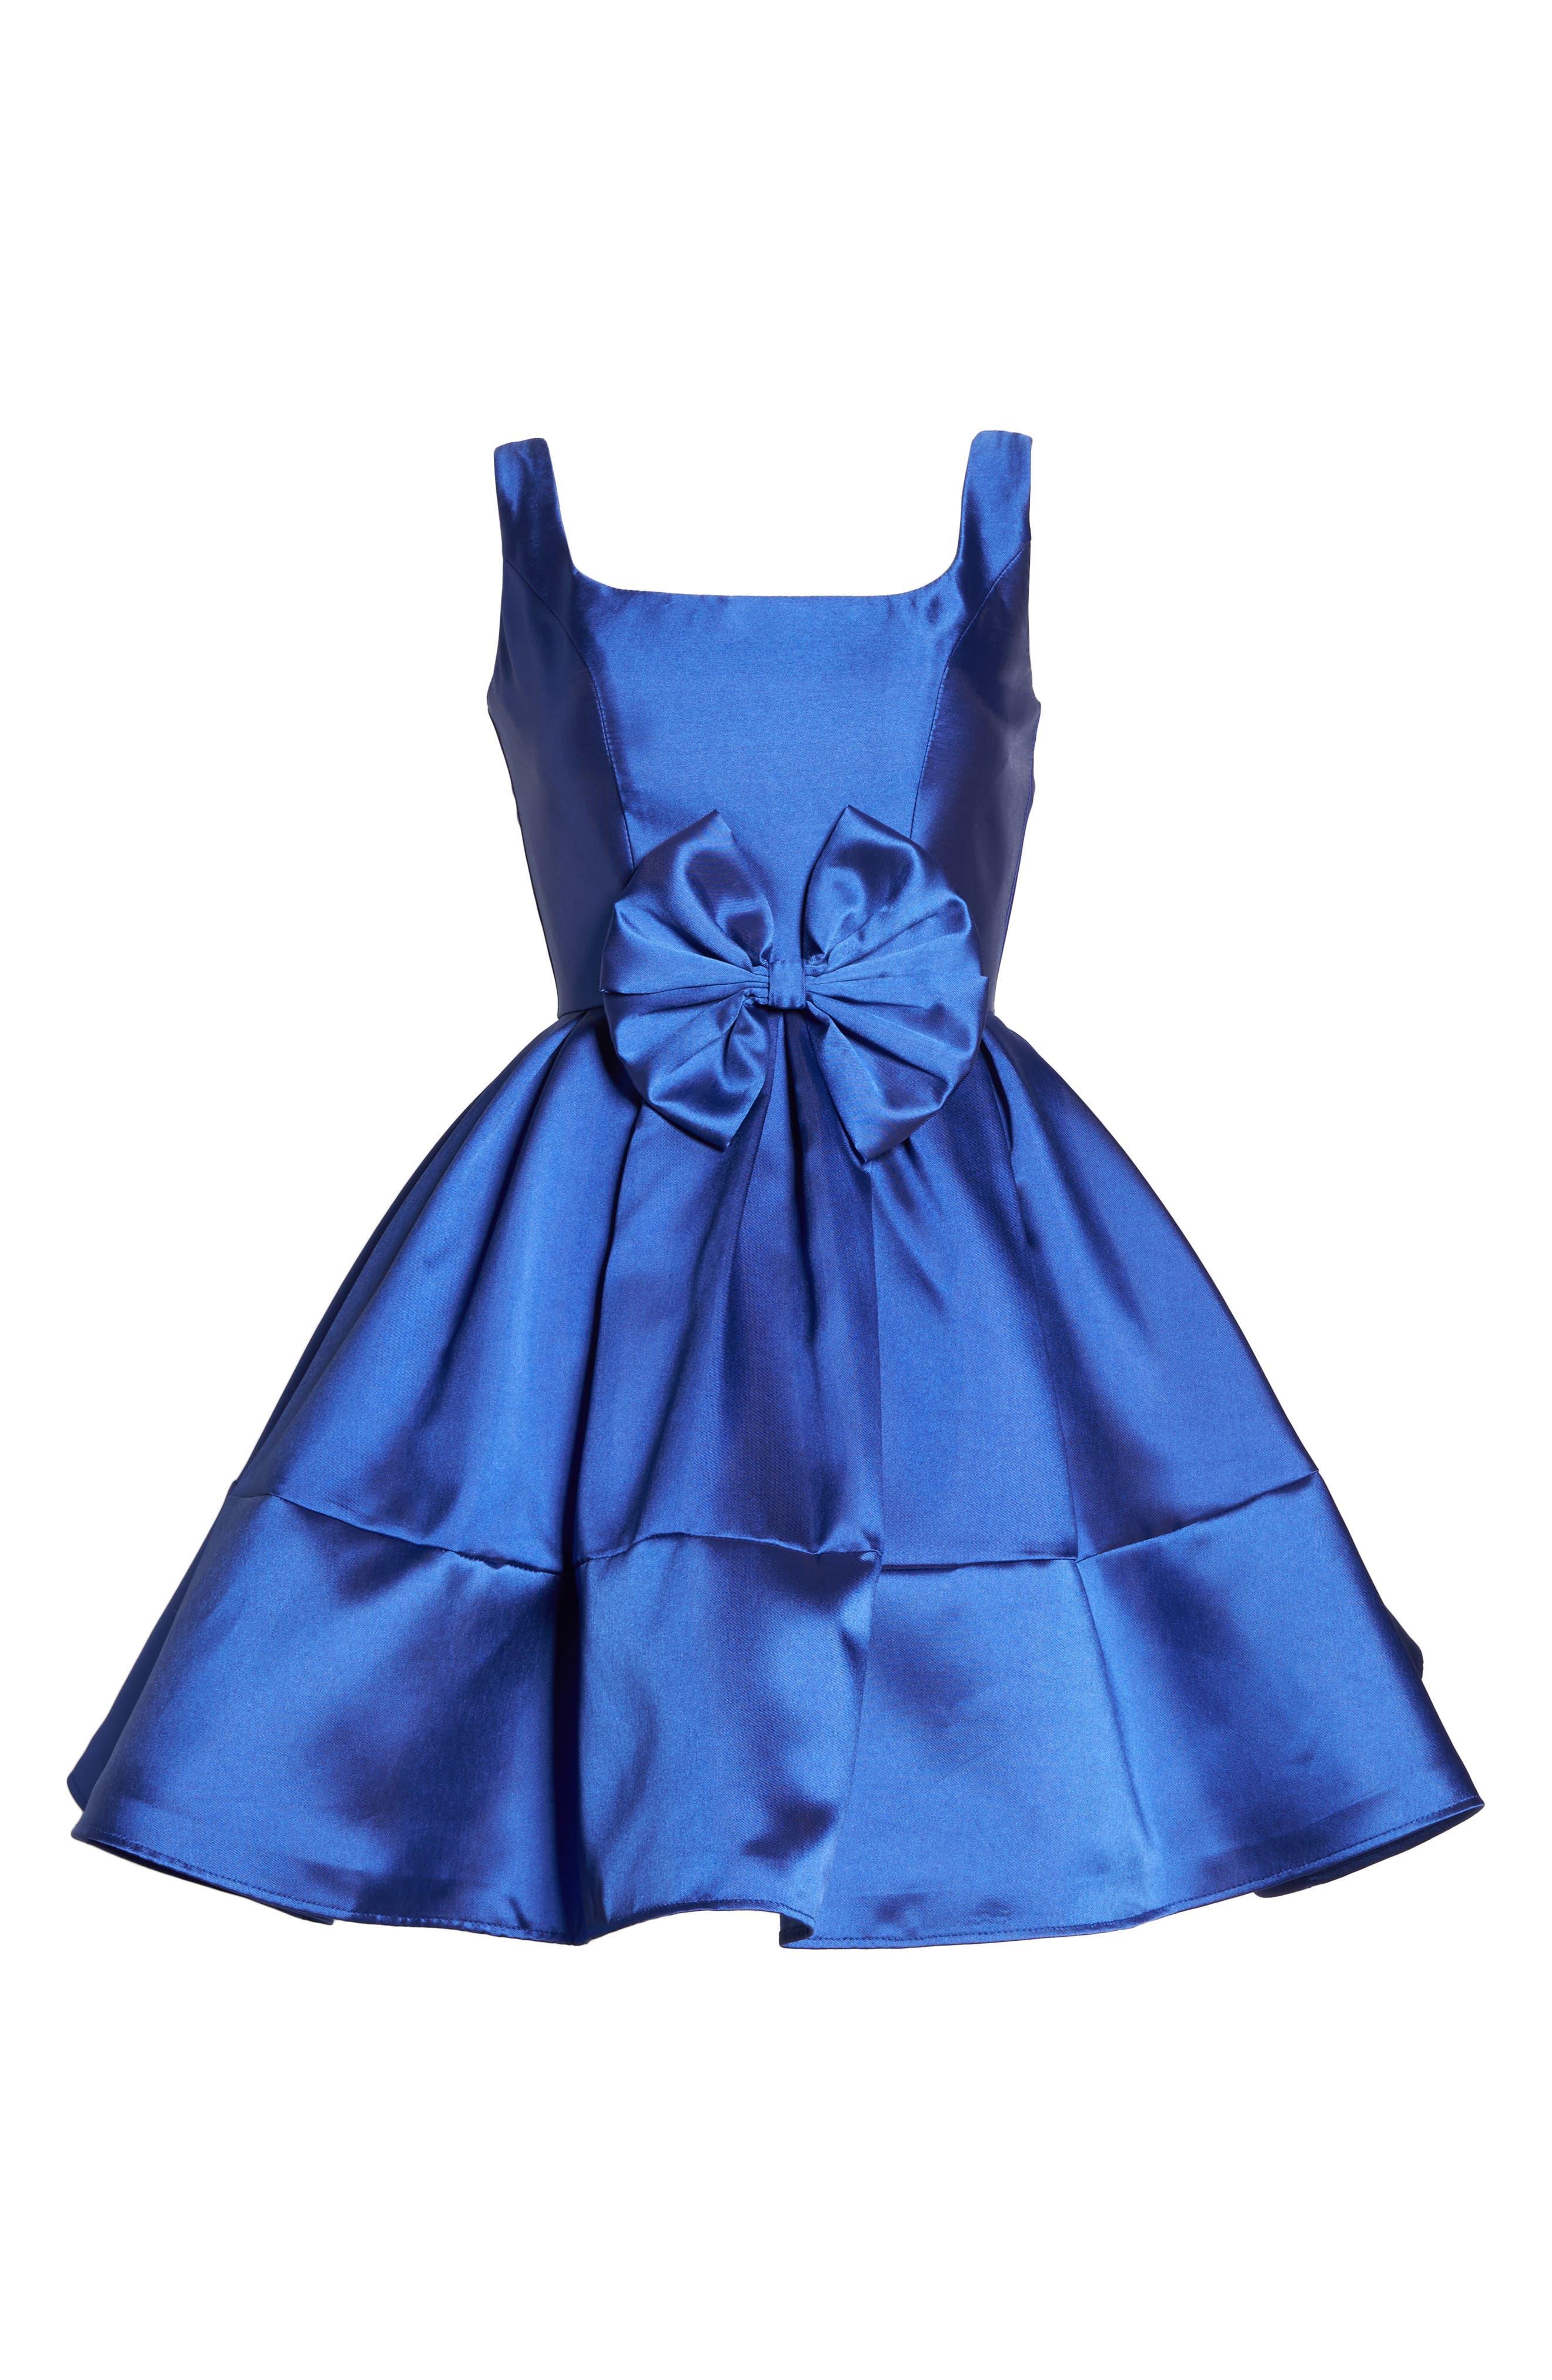 Square Neck Mikado Party Dress,                             Alternate thumbnail 6, color,                             Royal